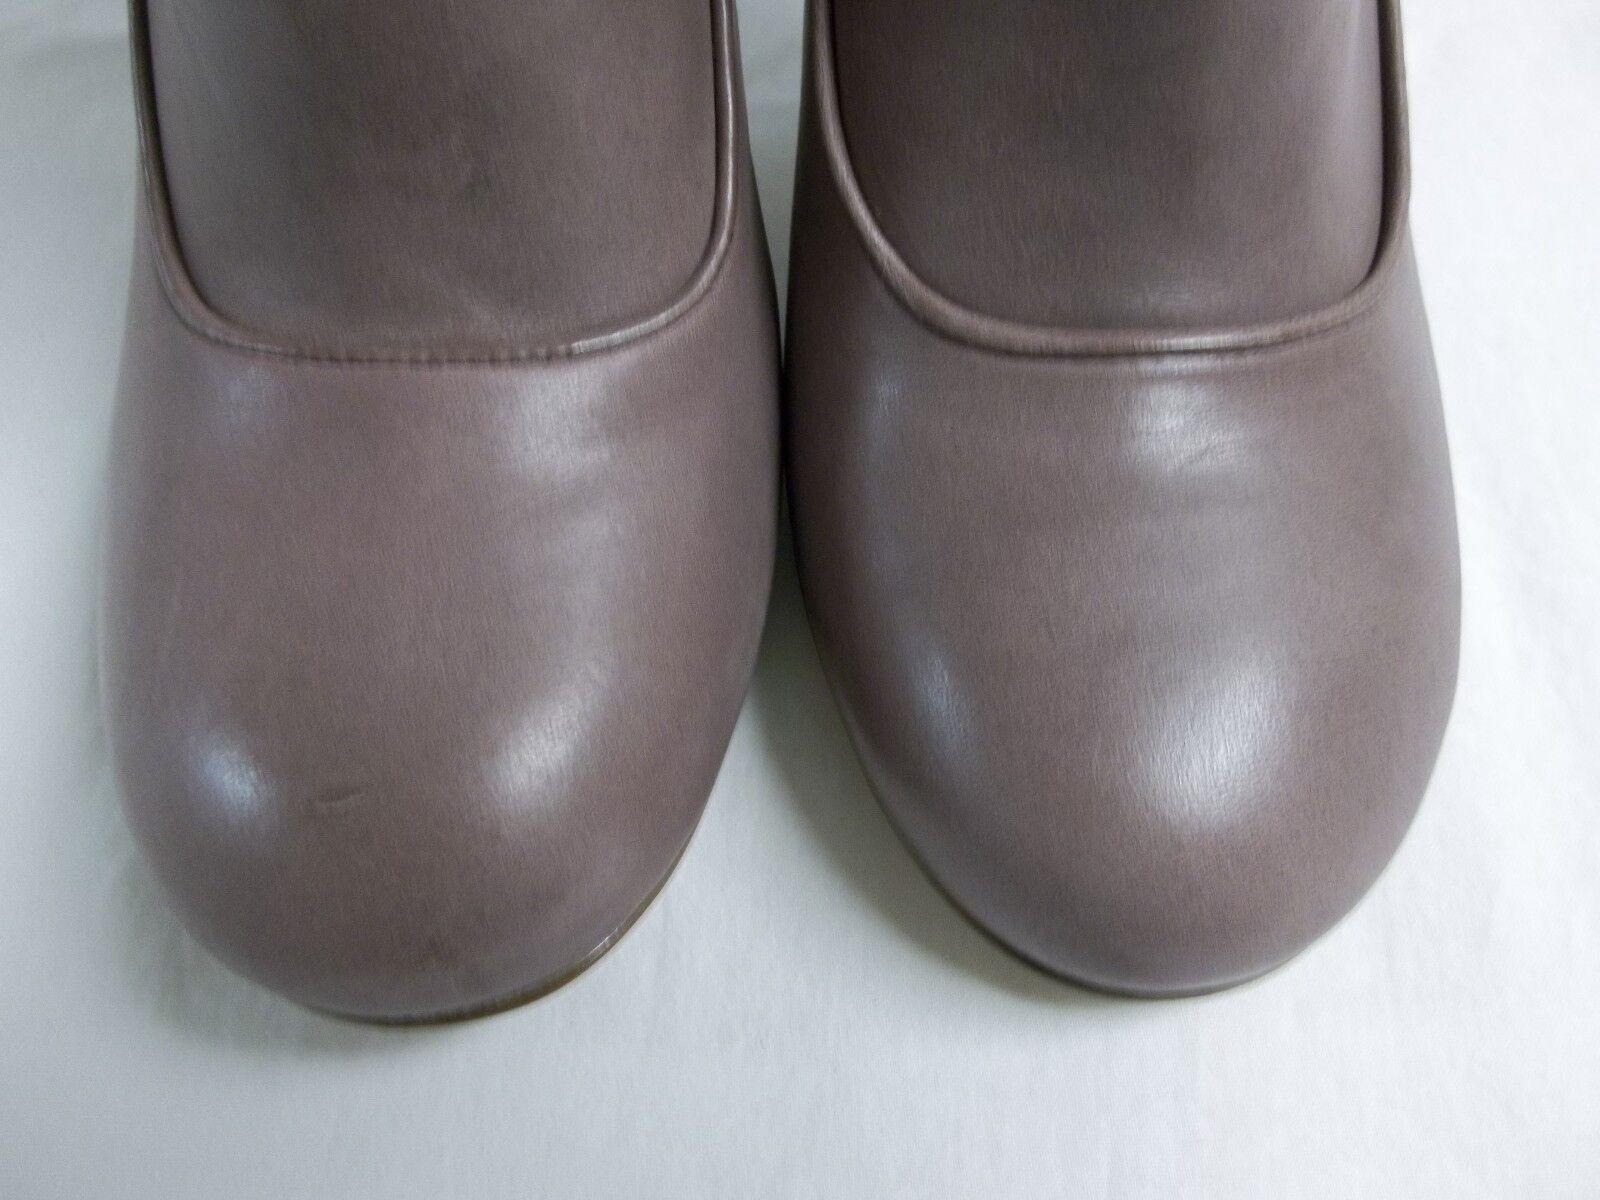 Rockport Größe Leder 10 M Presia Leder Größe Heels Booties New Damenschuhe Schuhes b590c5